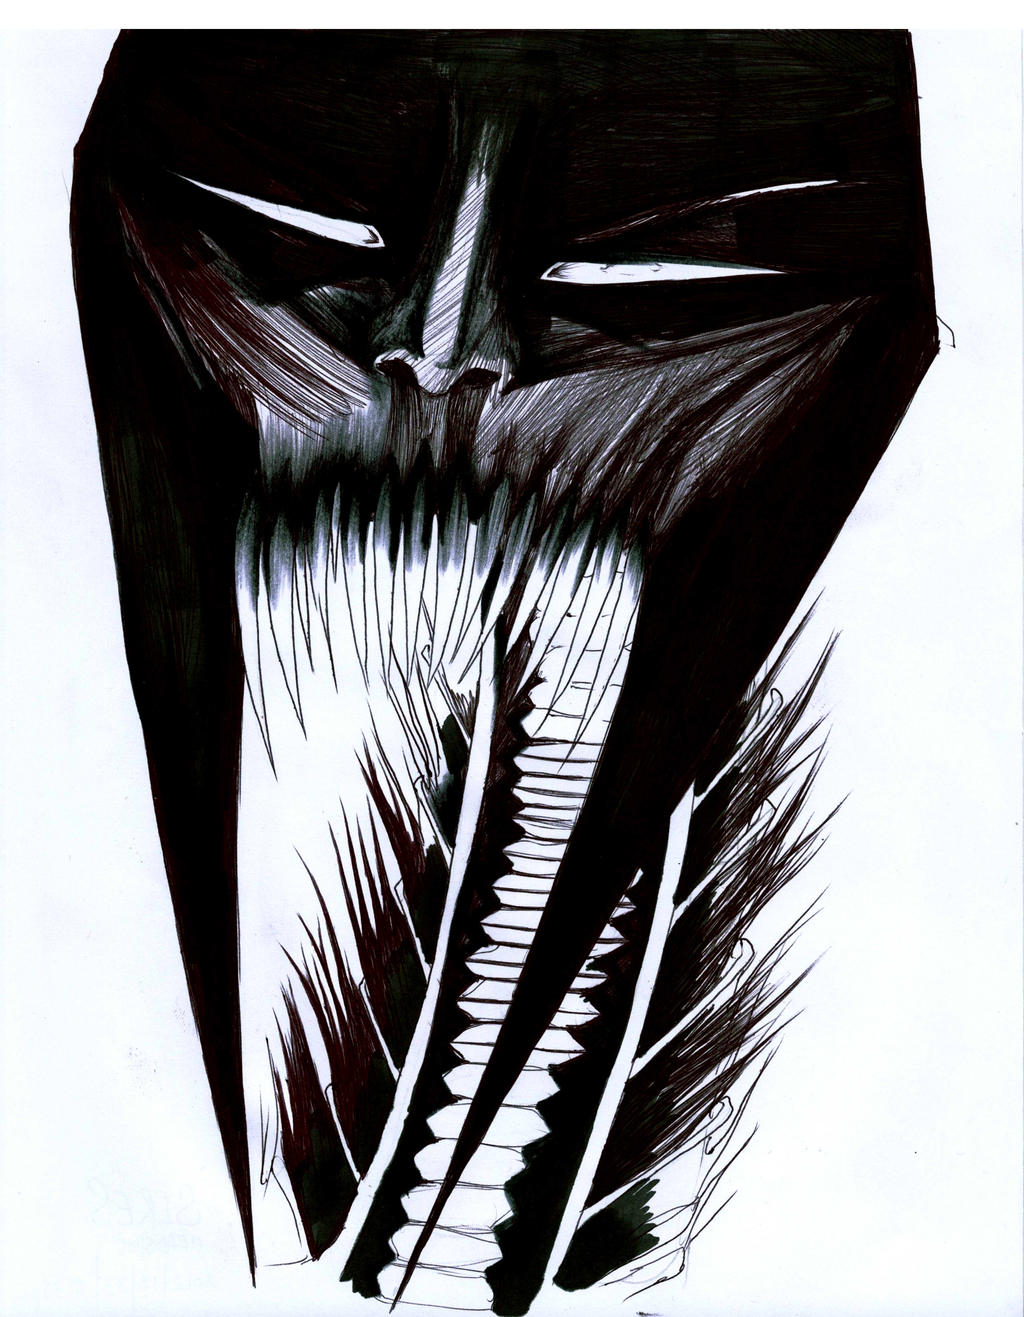 SIRES - headshot by Antervantei